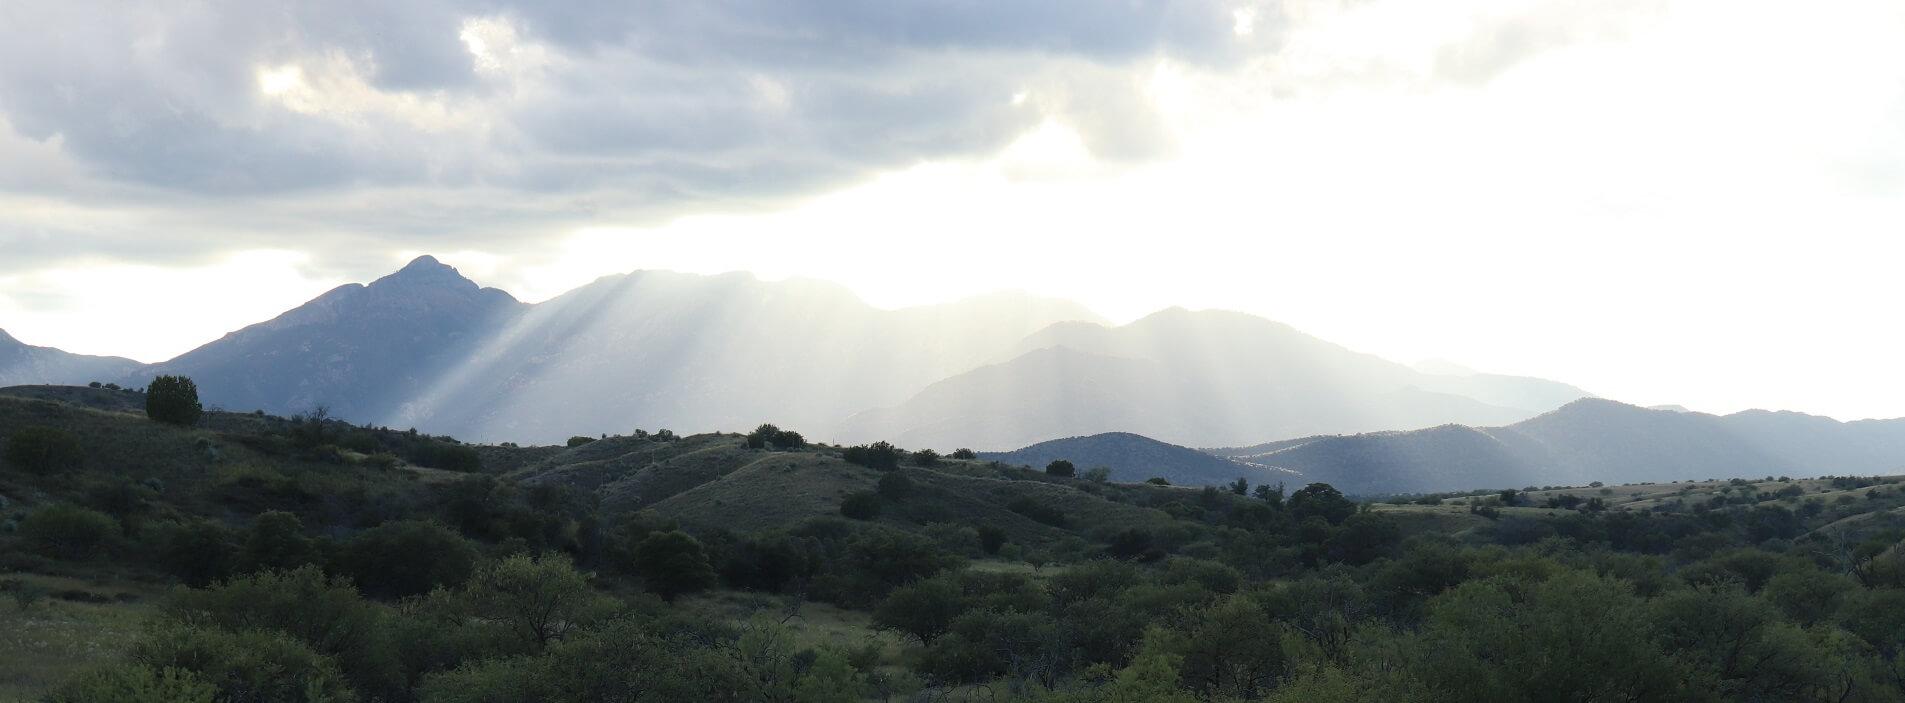 Image 1 – 2019 09 28 mountain rays